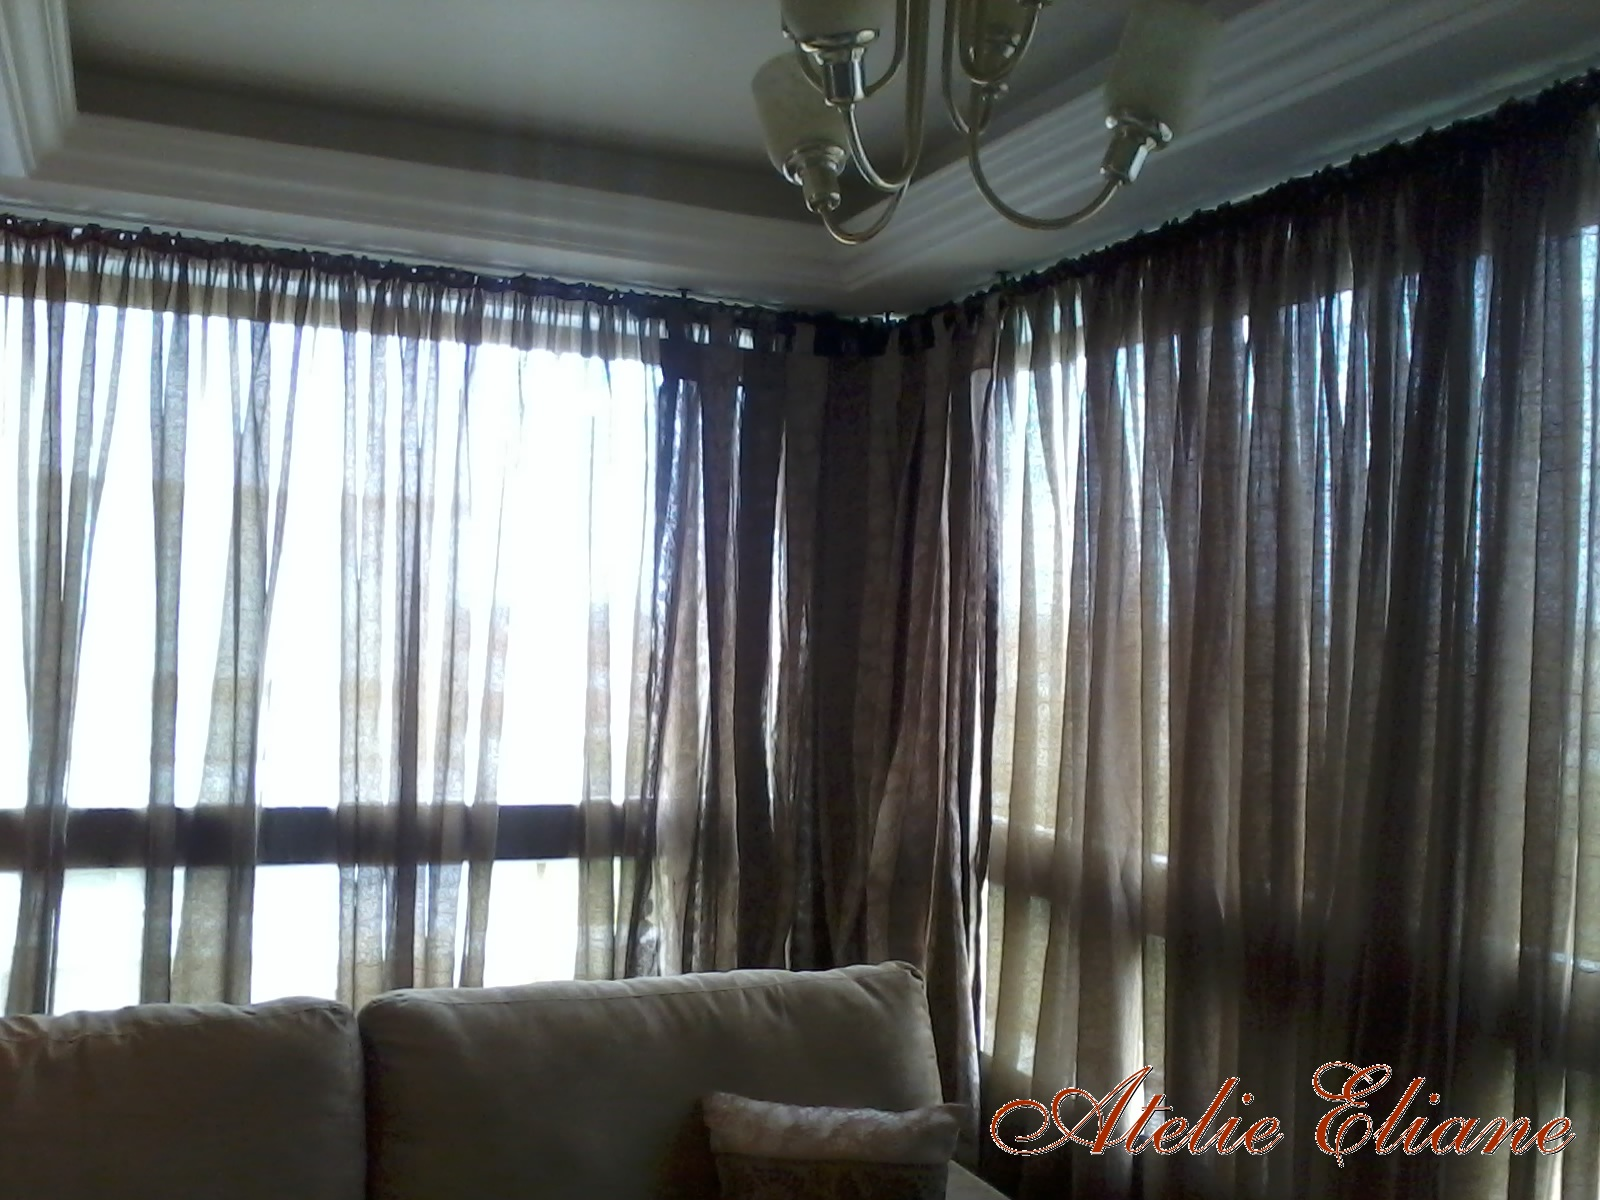 #50697B Atelieliane: Cortinas sala de estar 1600x1200 píxeis em Cortinas Chiques Para Sala De Estar